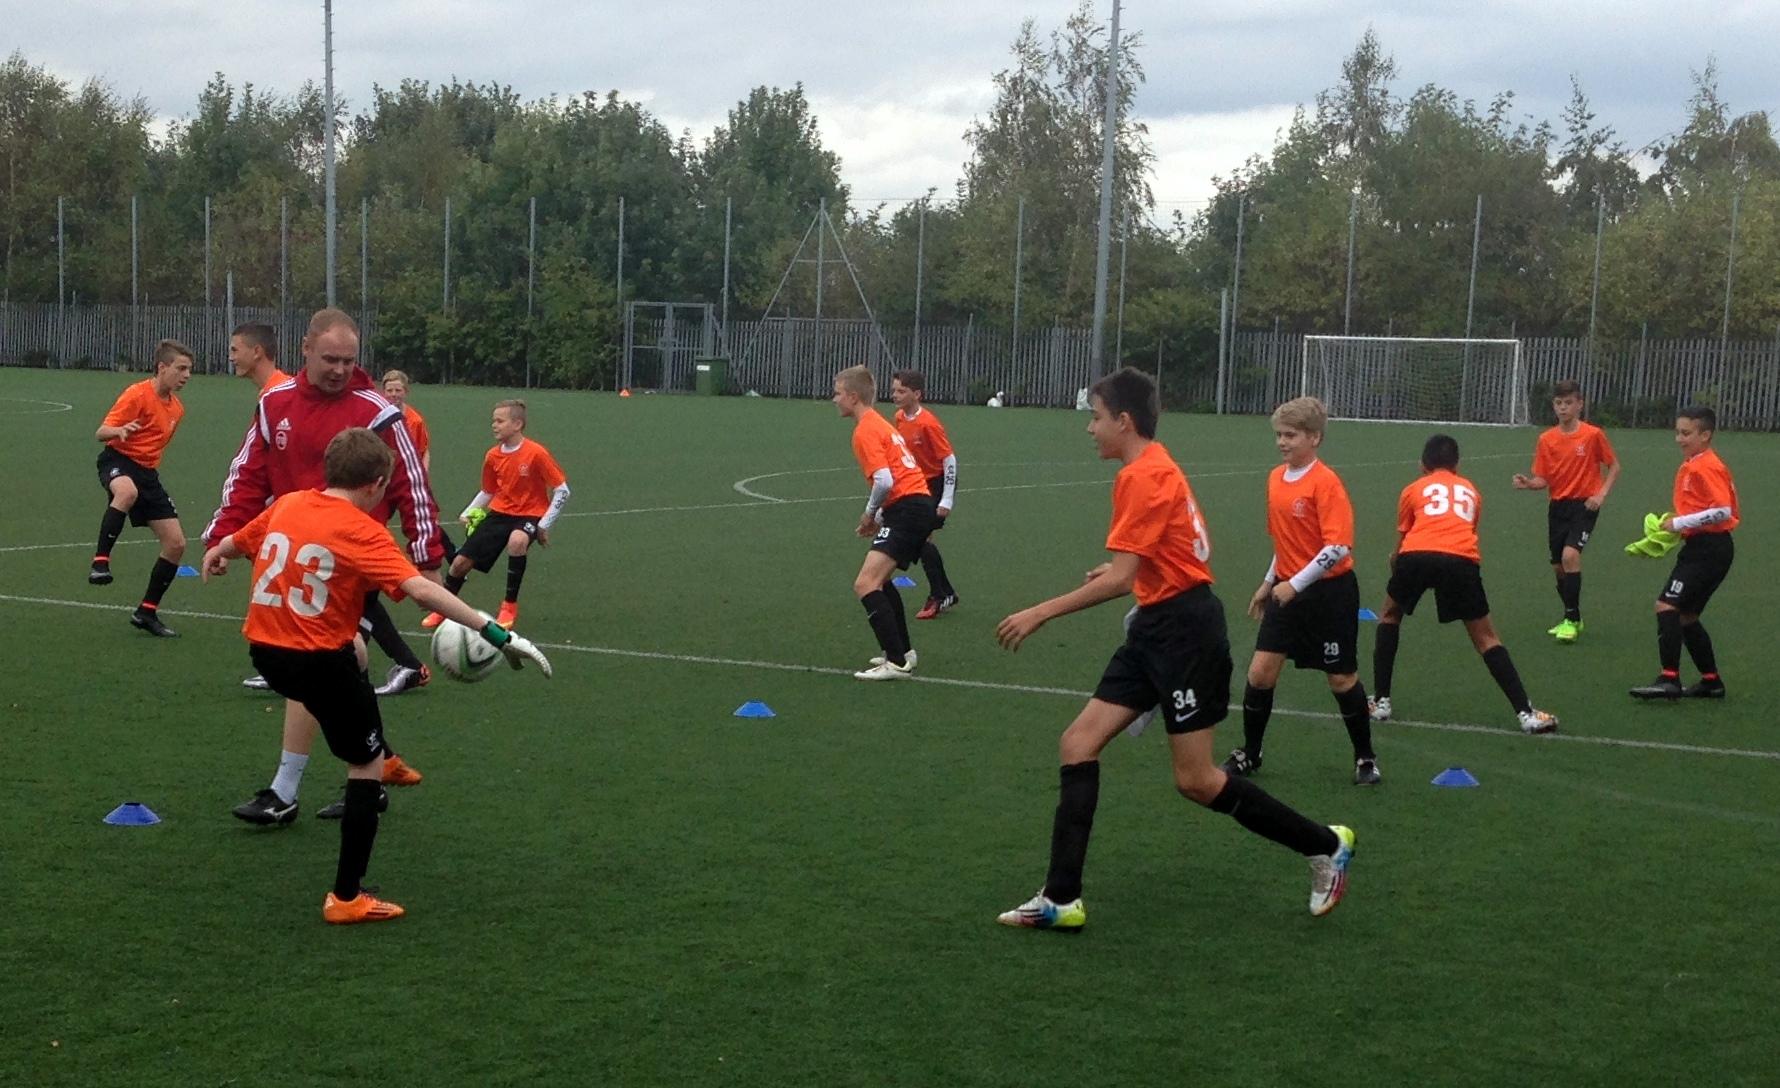 Training at Sheff Utd